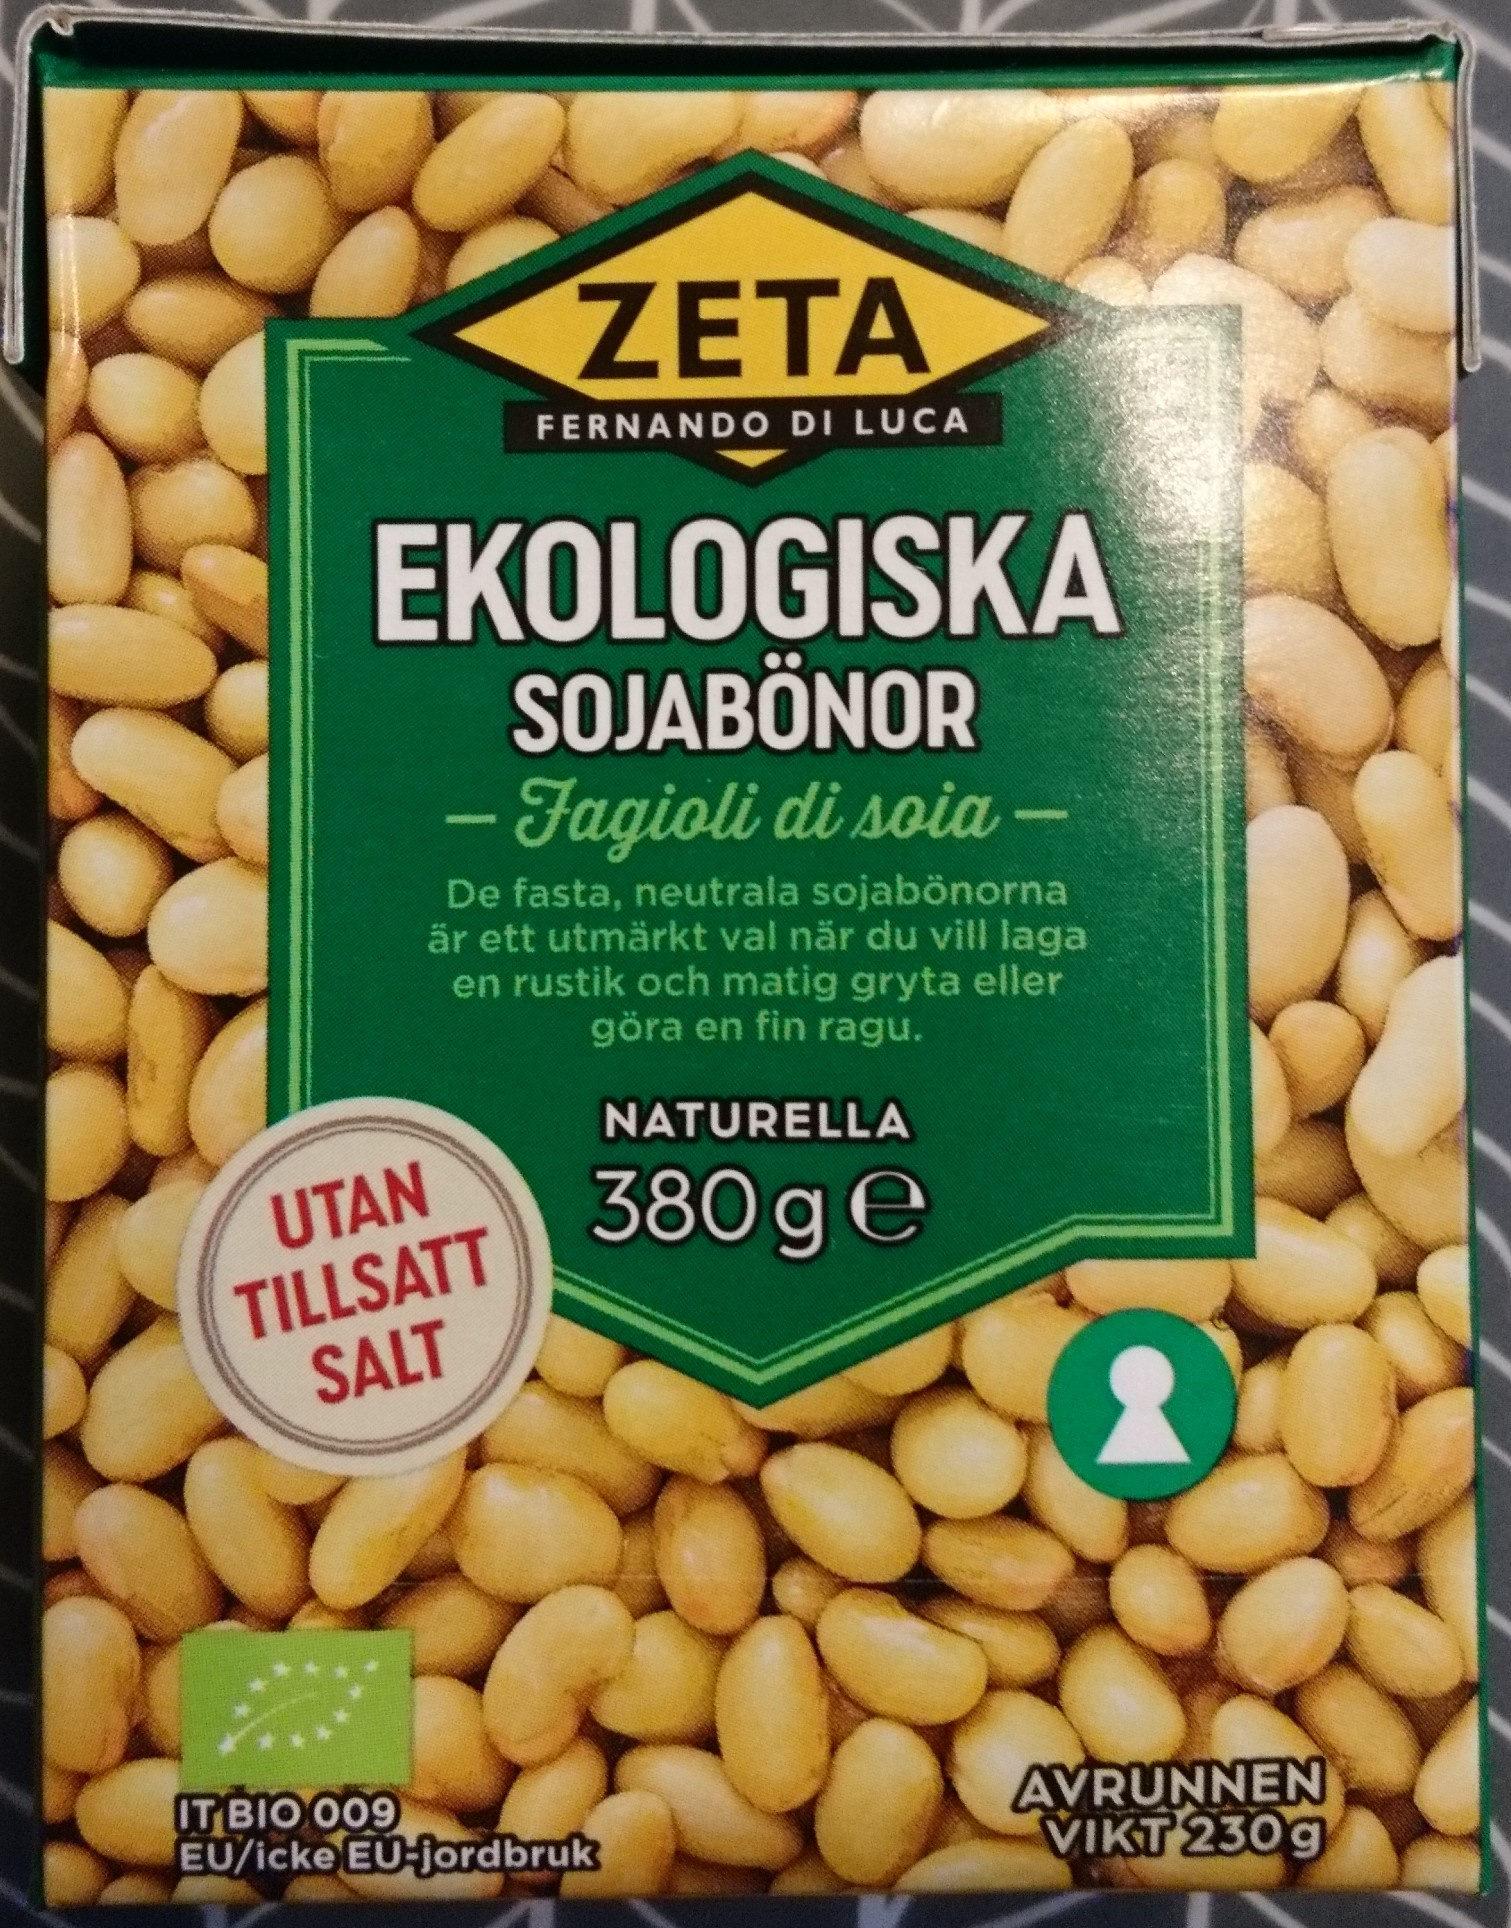 Ekologiska sojabönor - Product